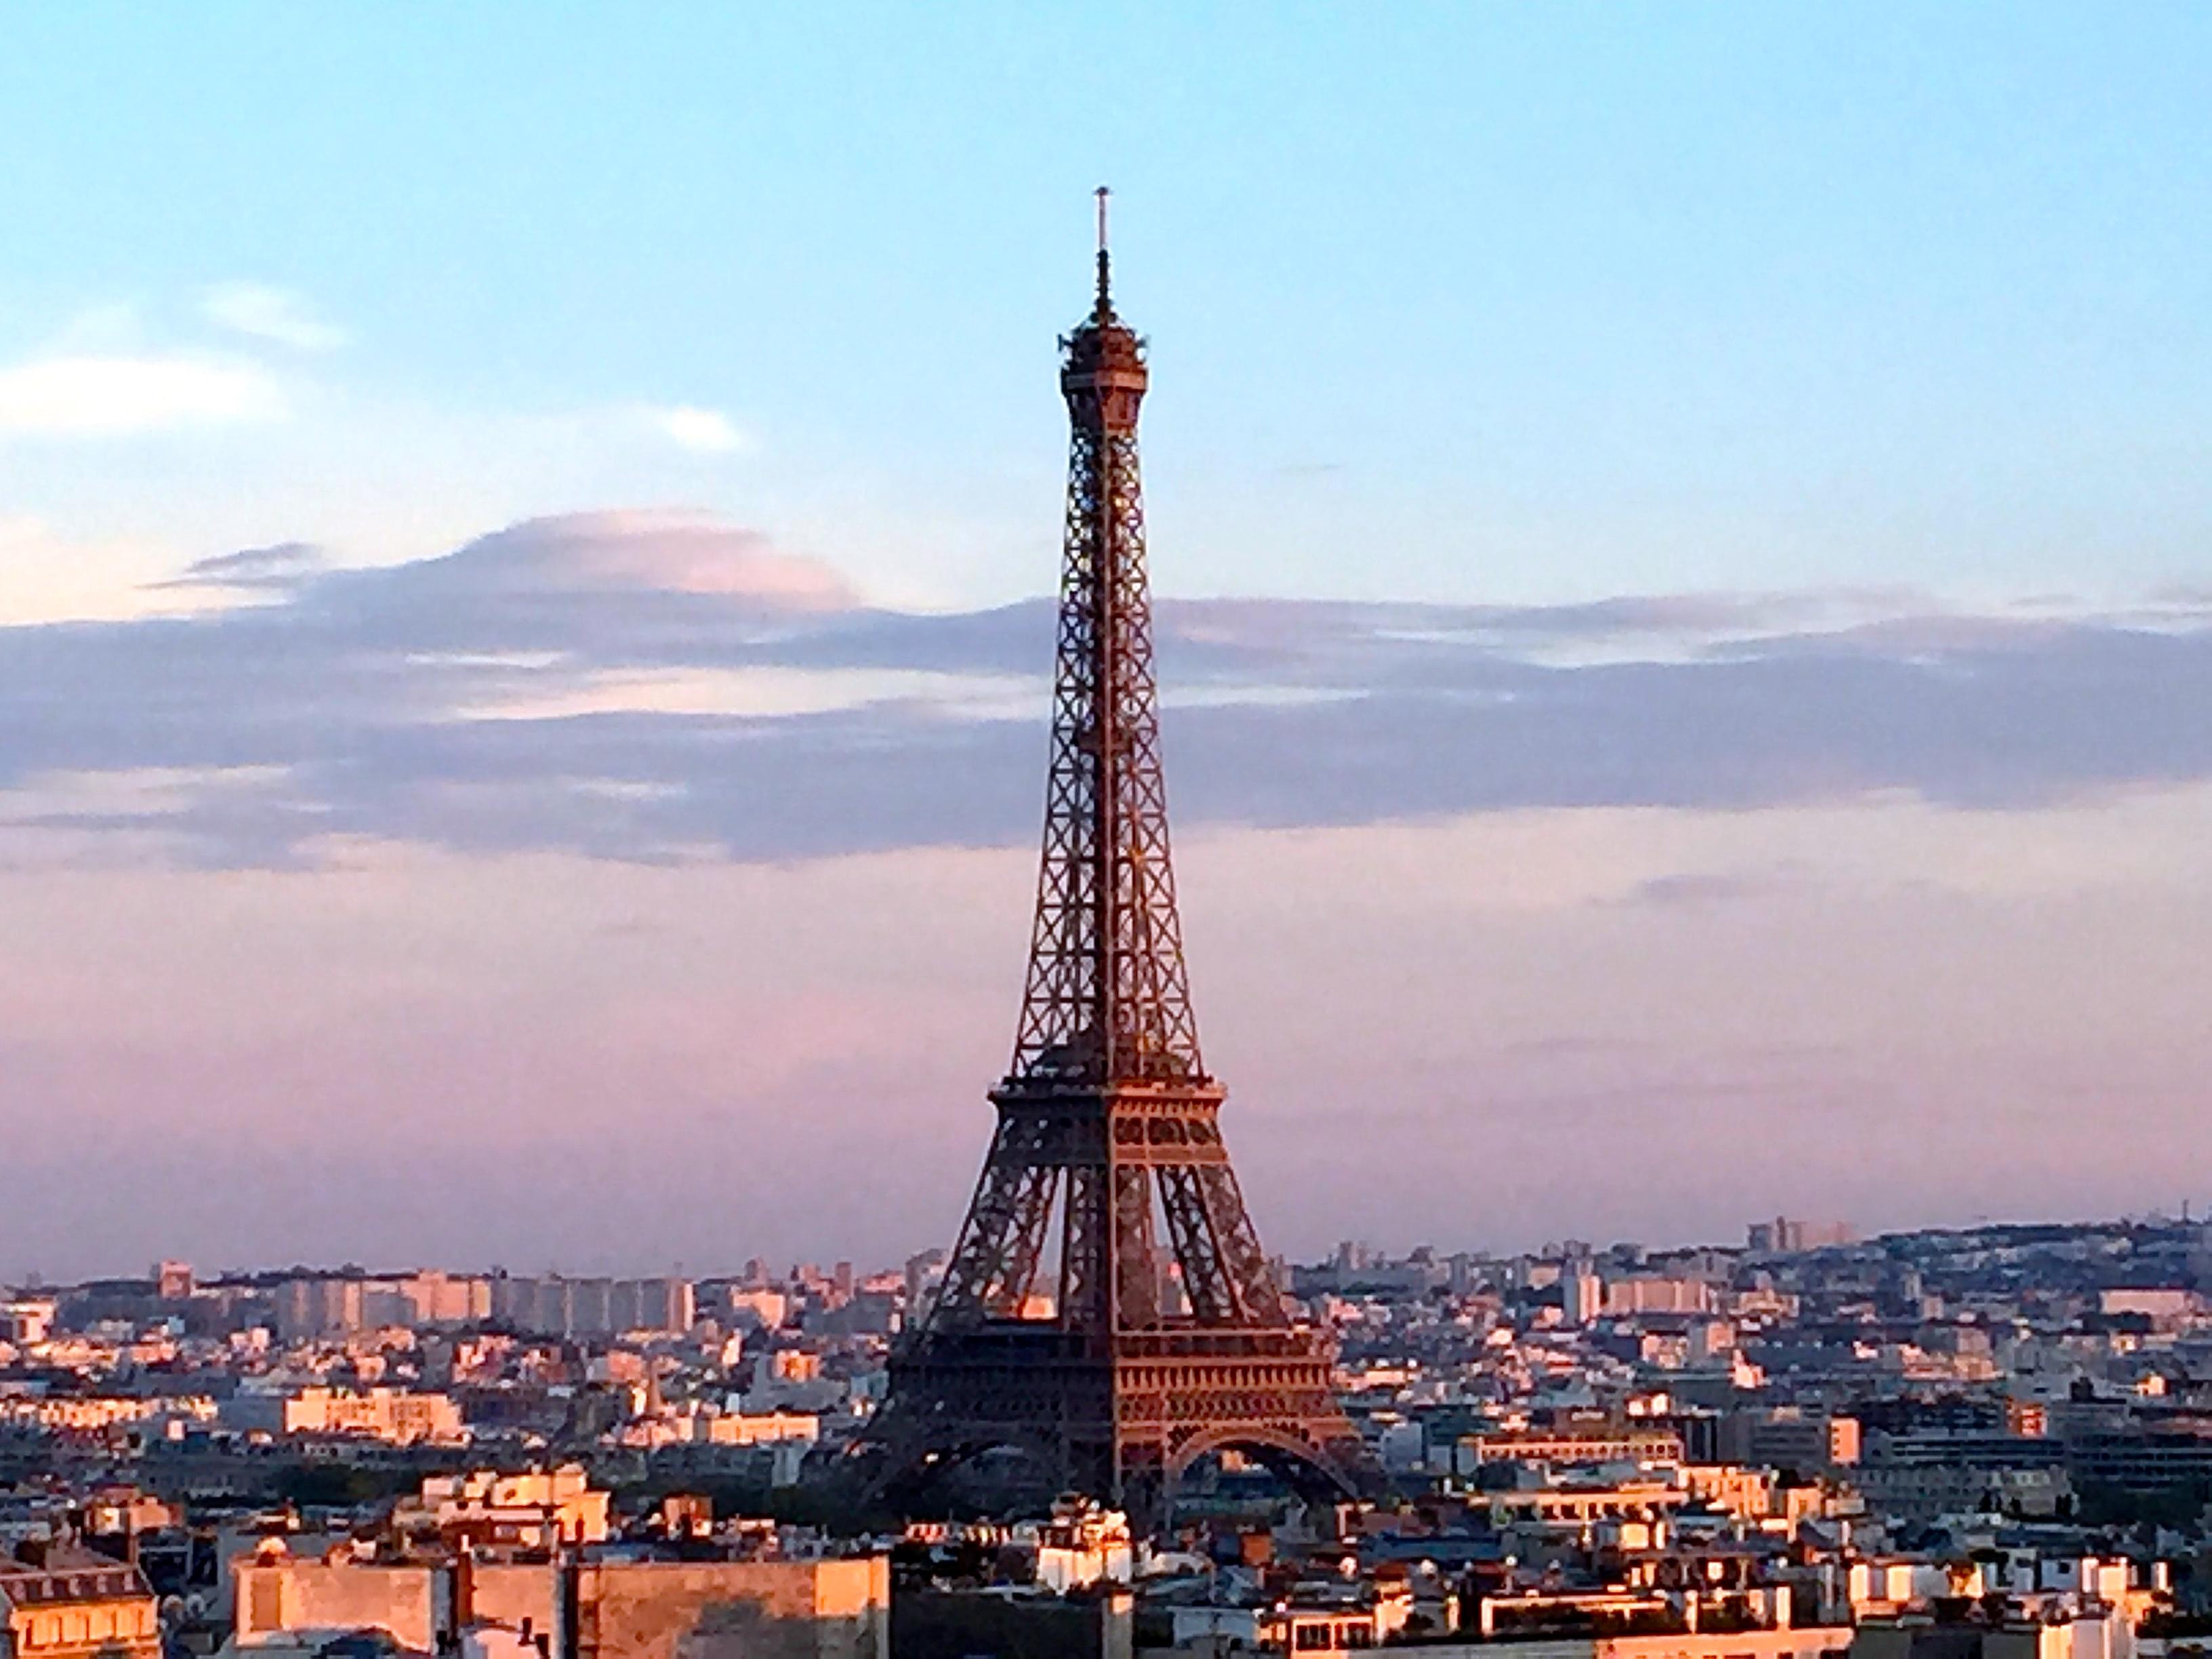 Sun setting behind Eiffel Tower